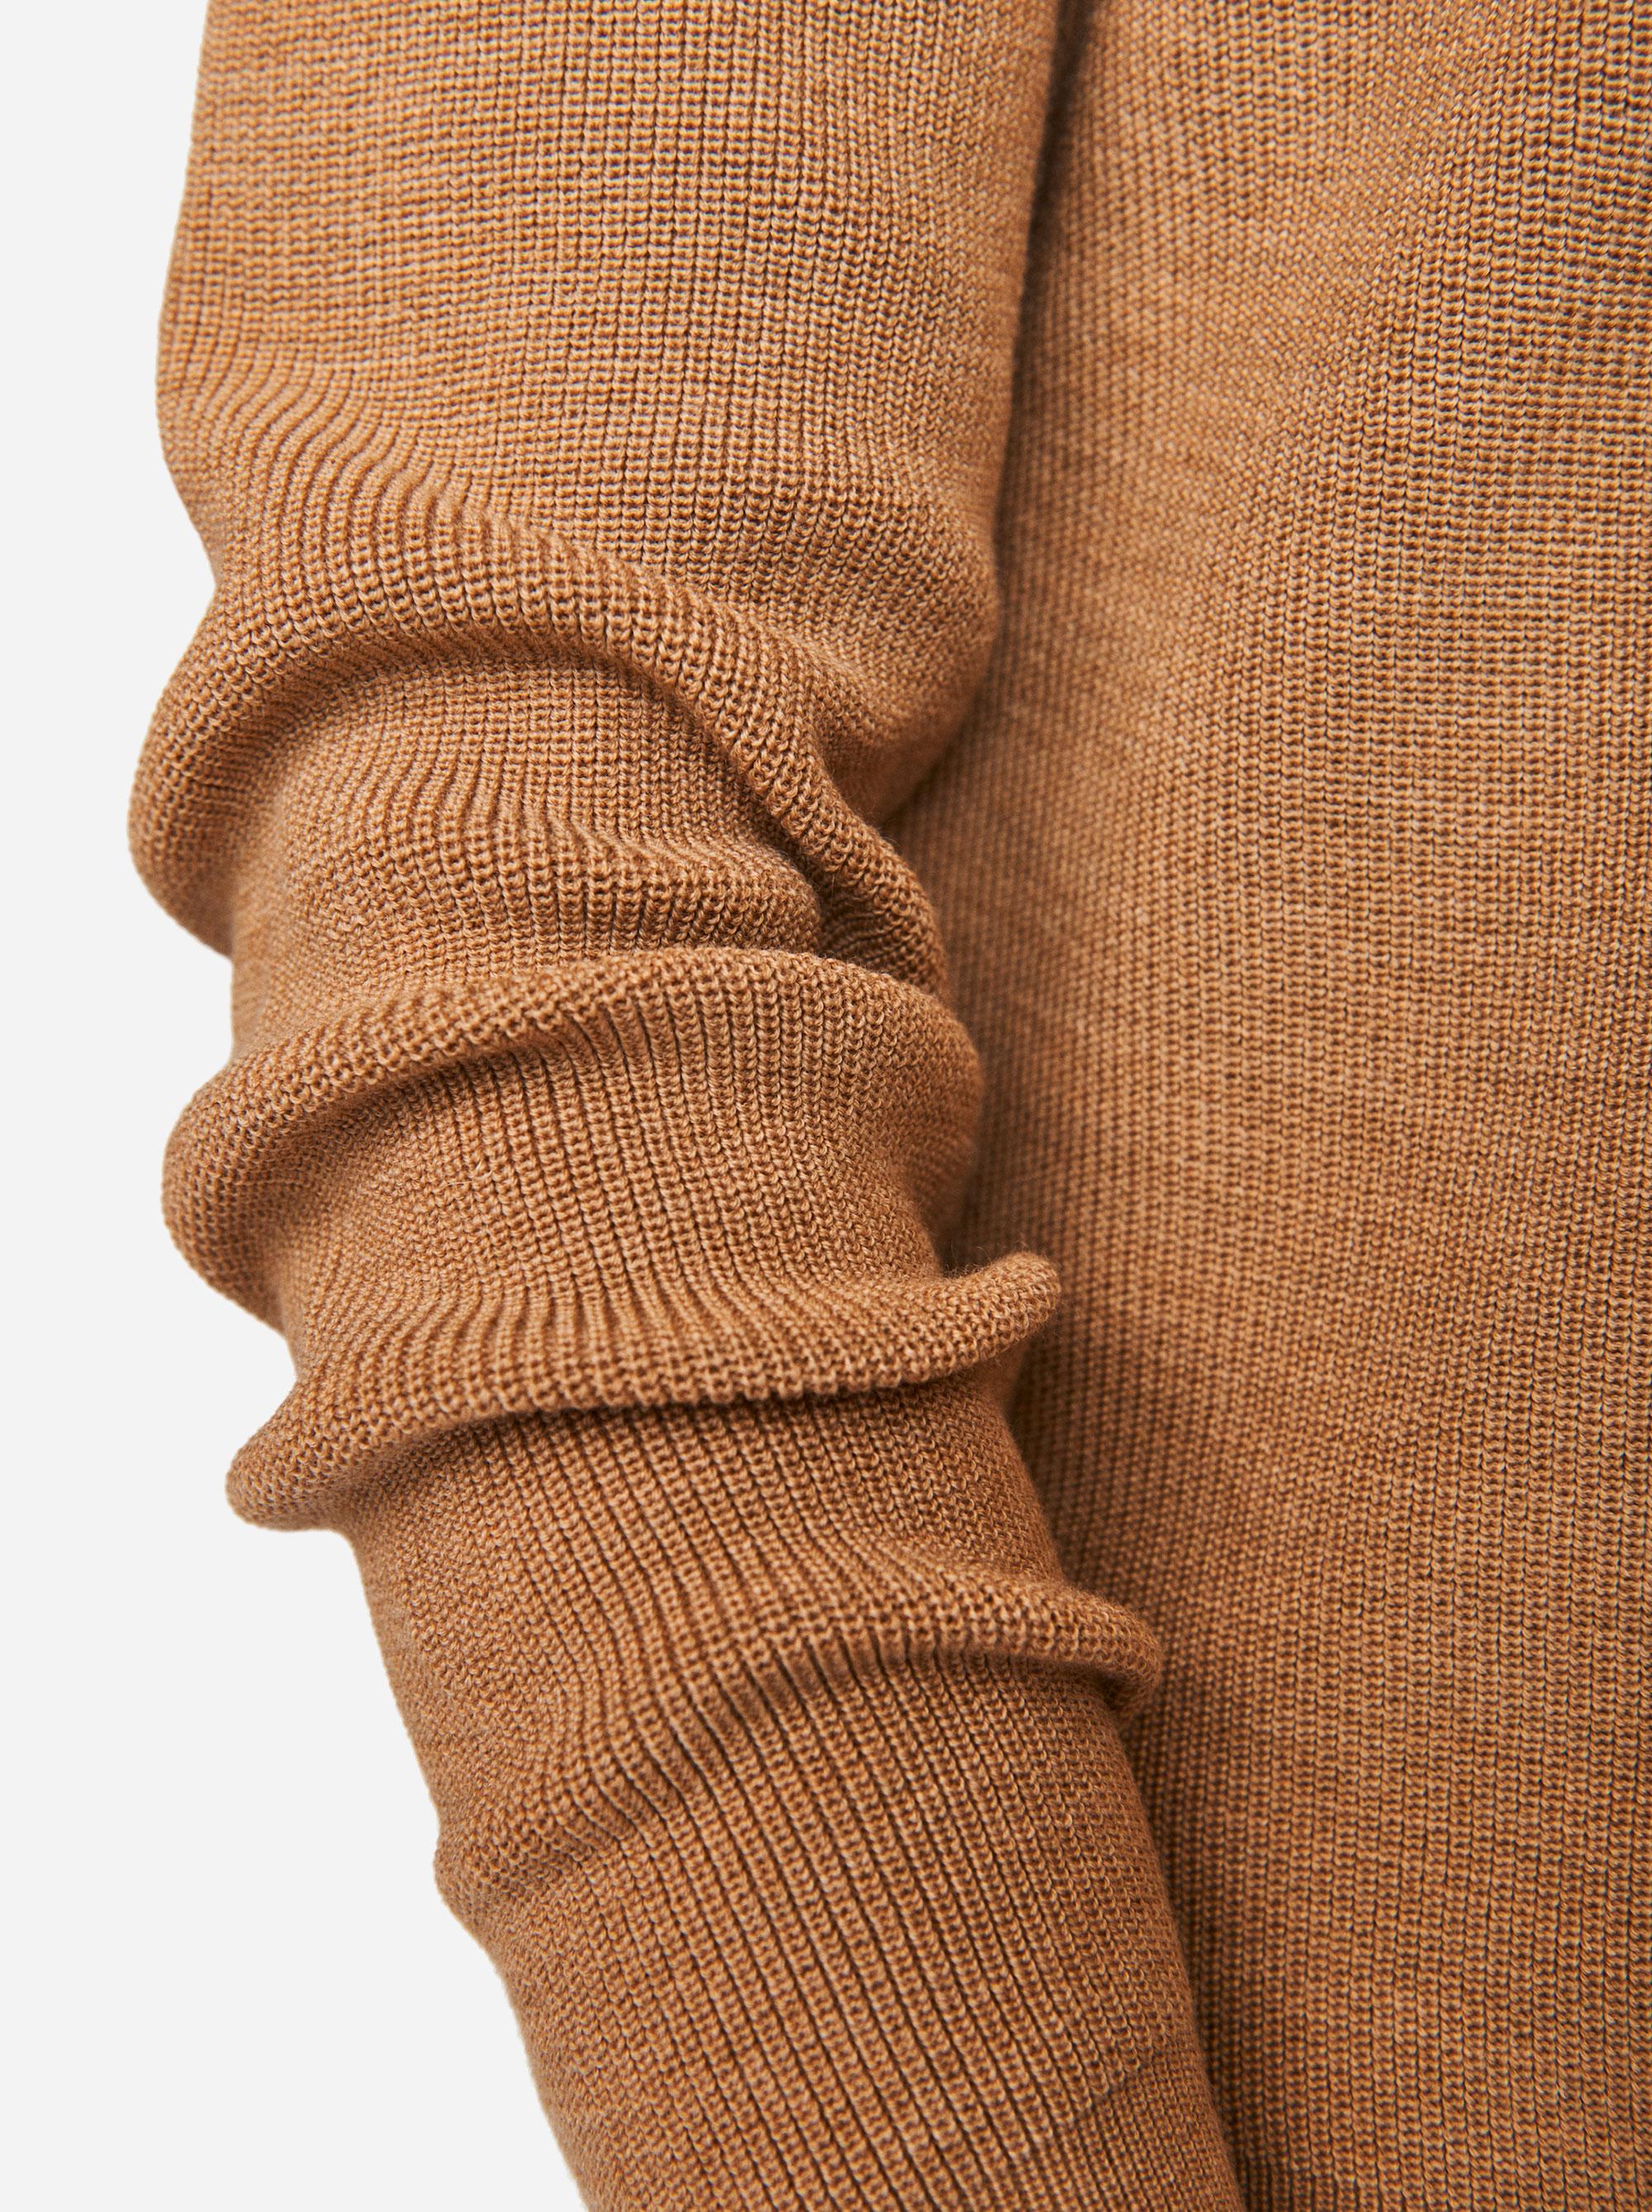 Teym - The Merino Sweater - Men - Camel - 2